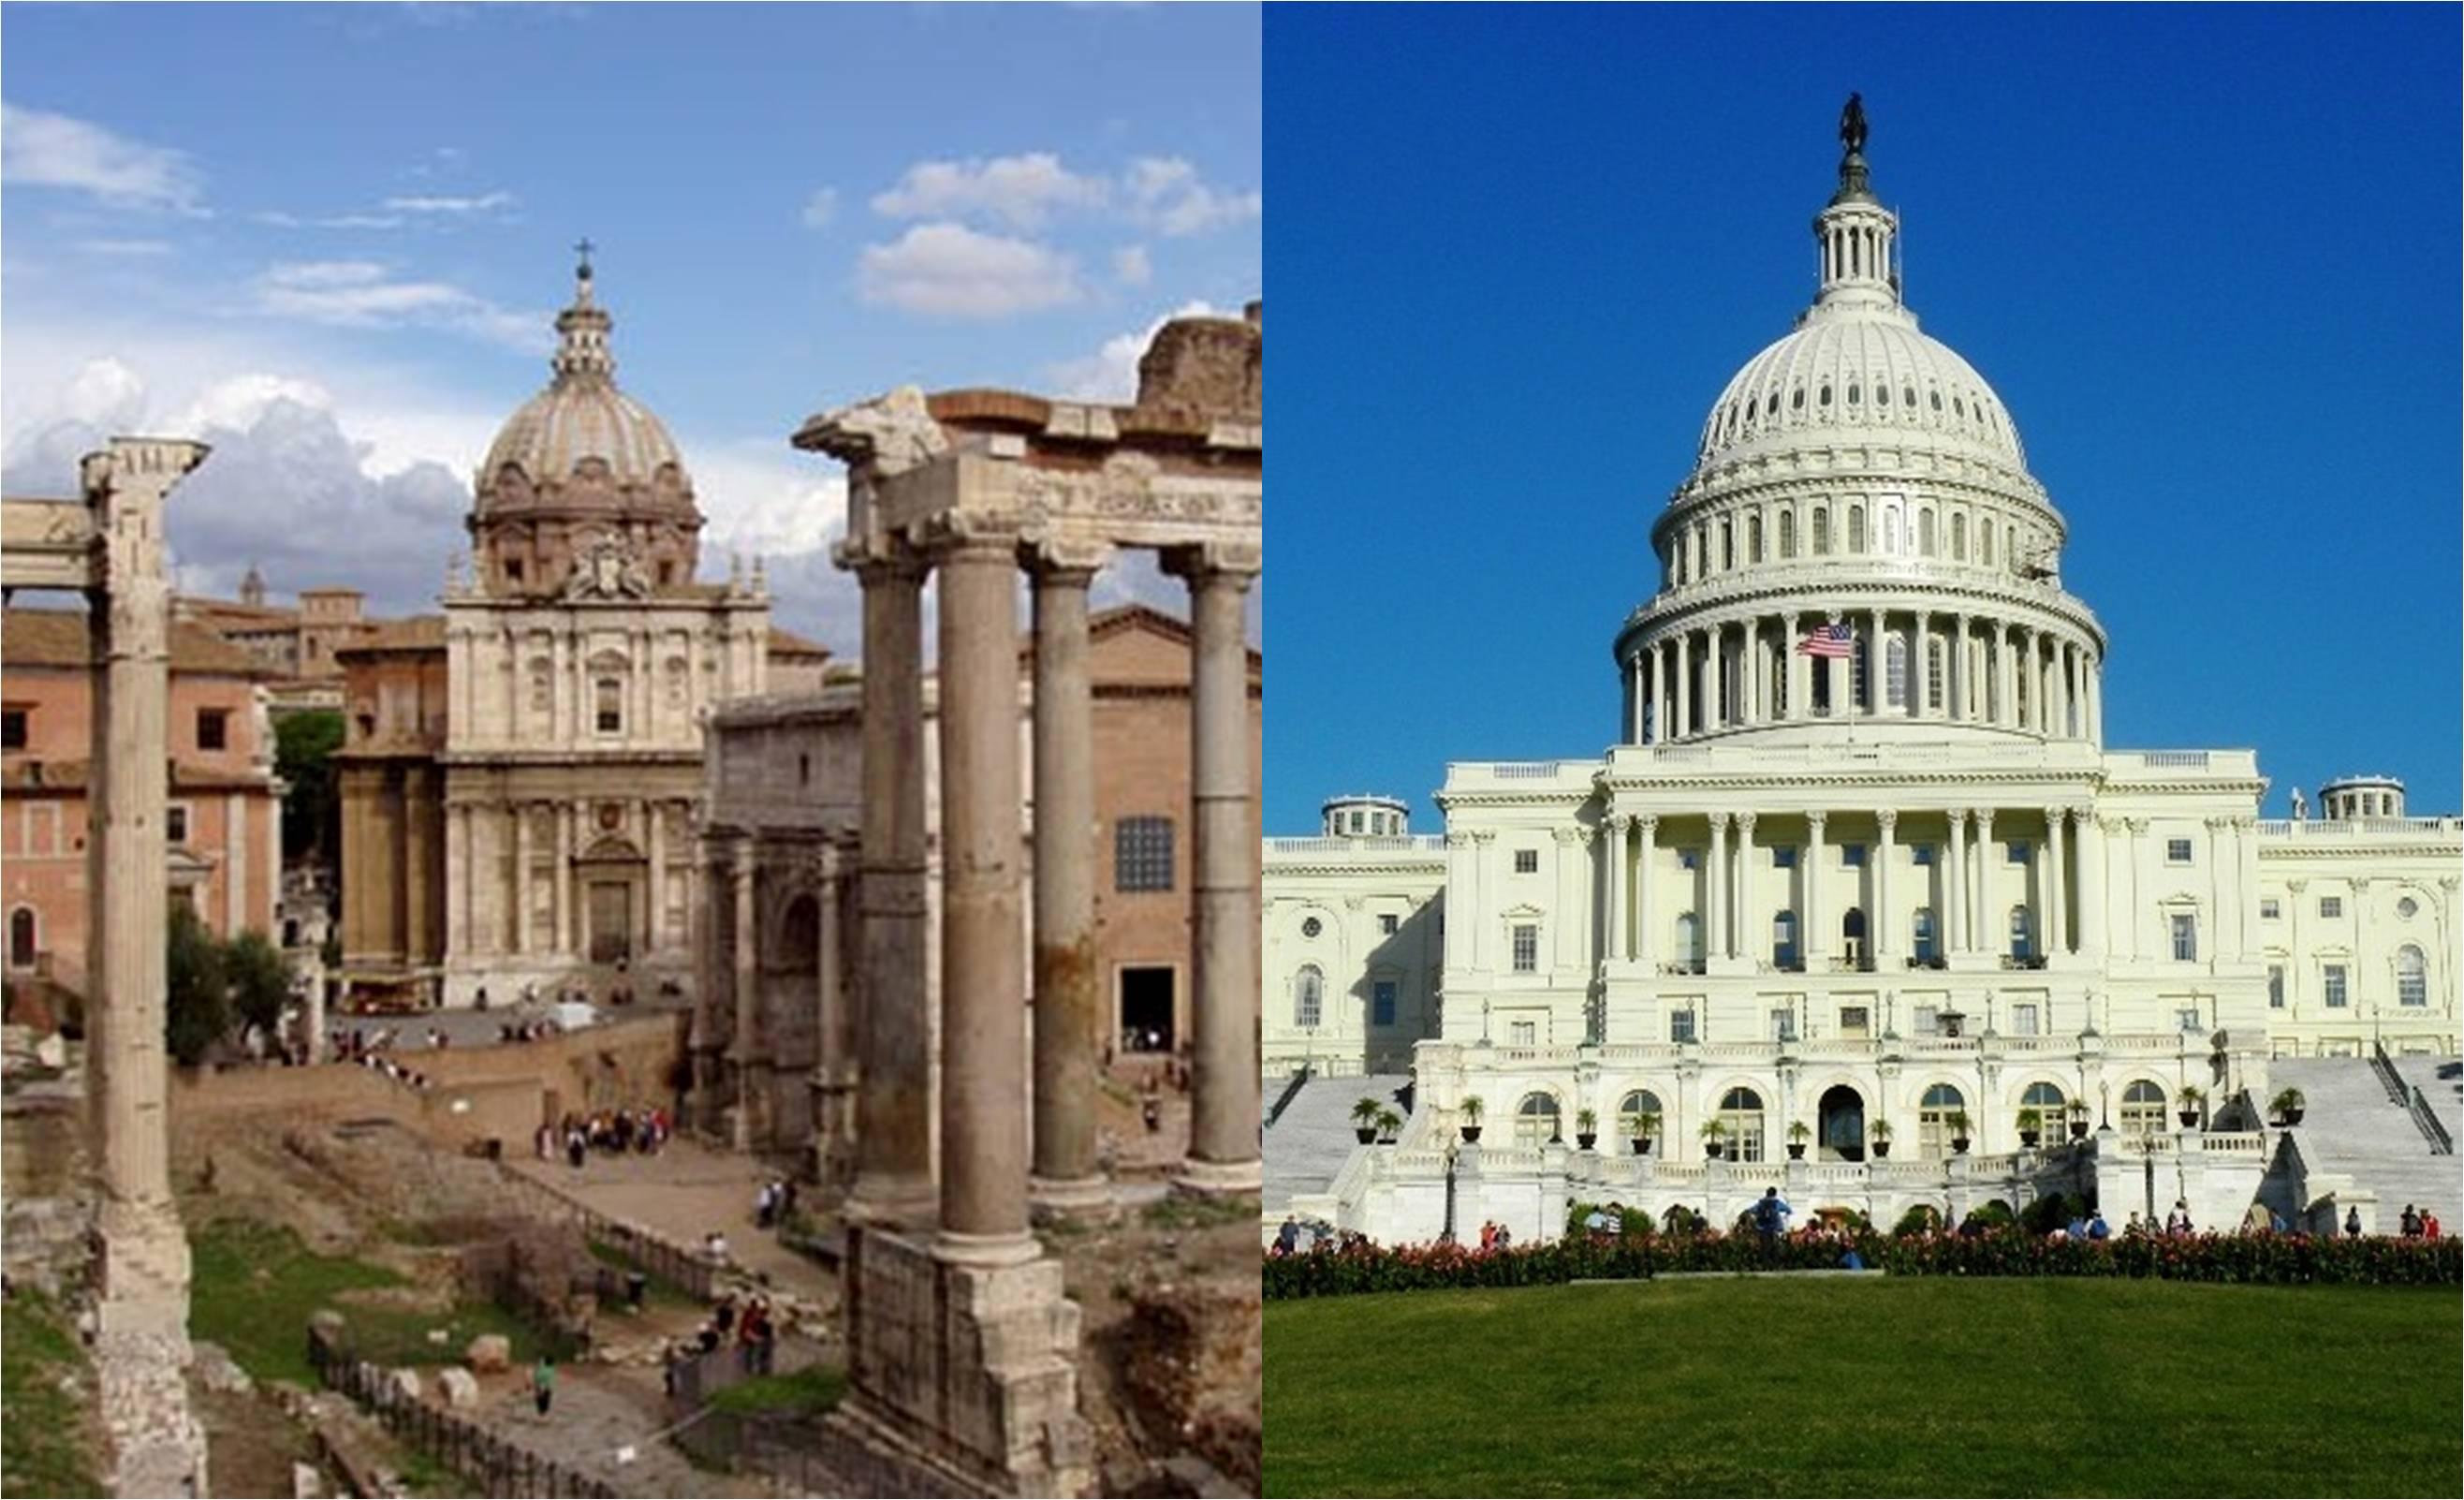 Rome and America: Feminism destroys